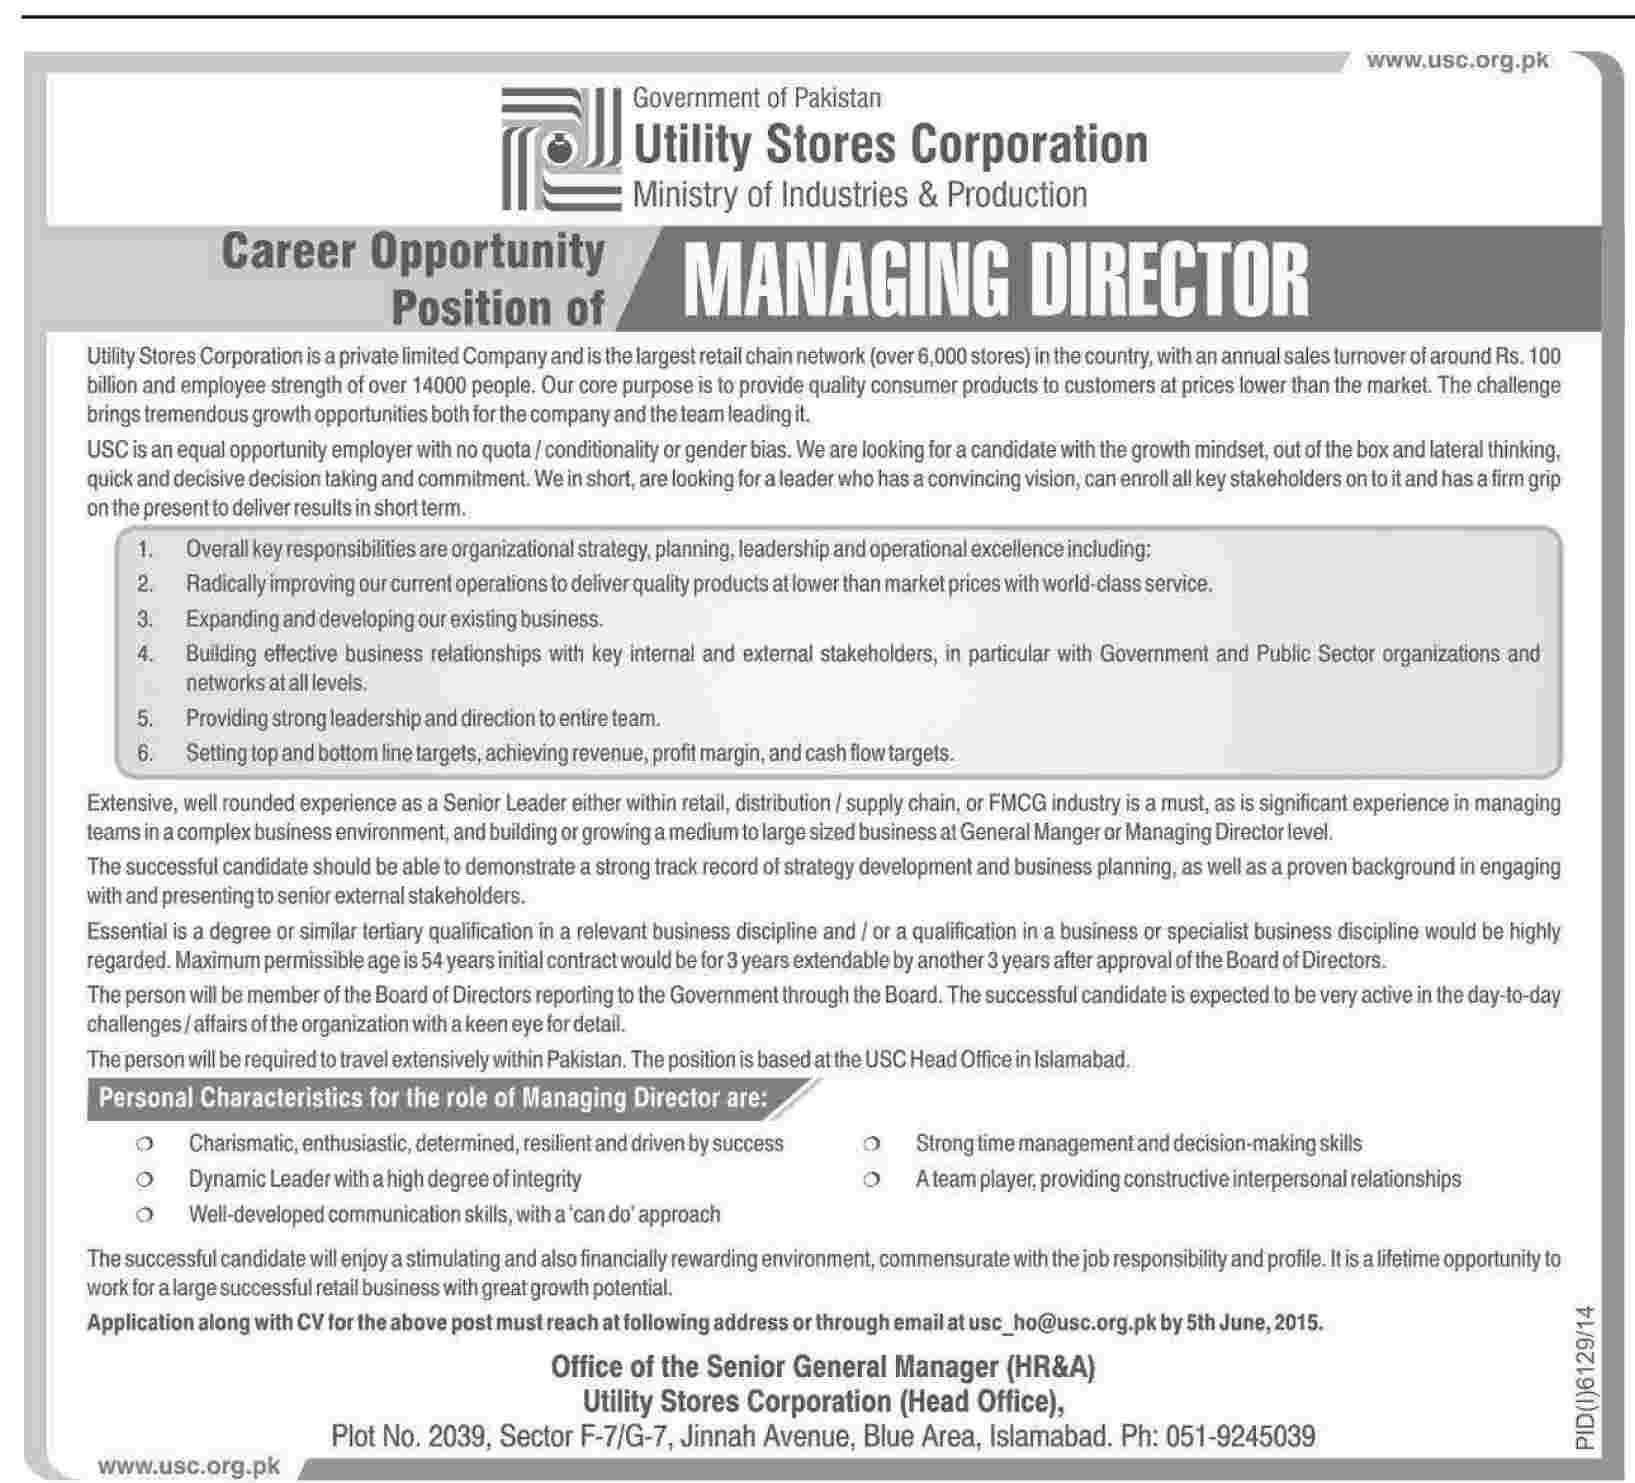 Utility Stores Corporation of Pakistan Jobs